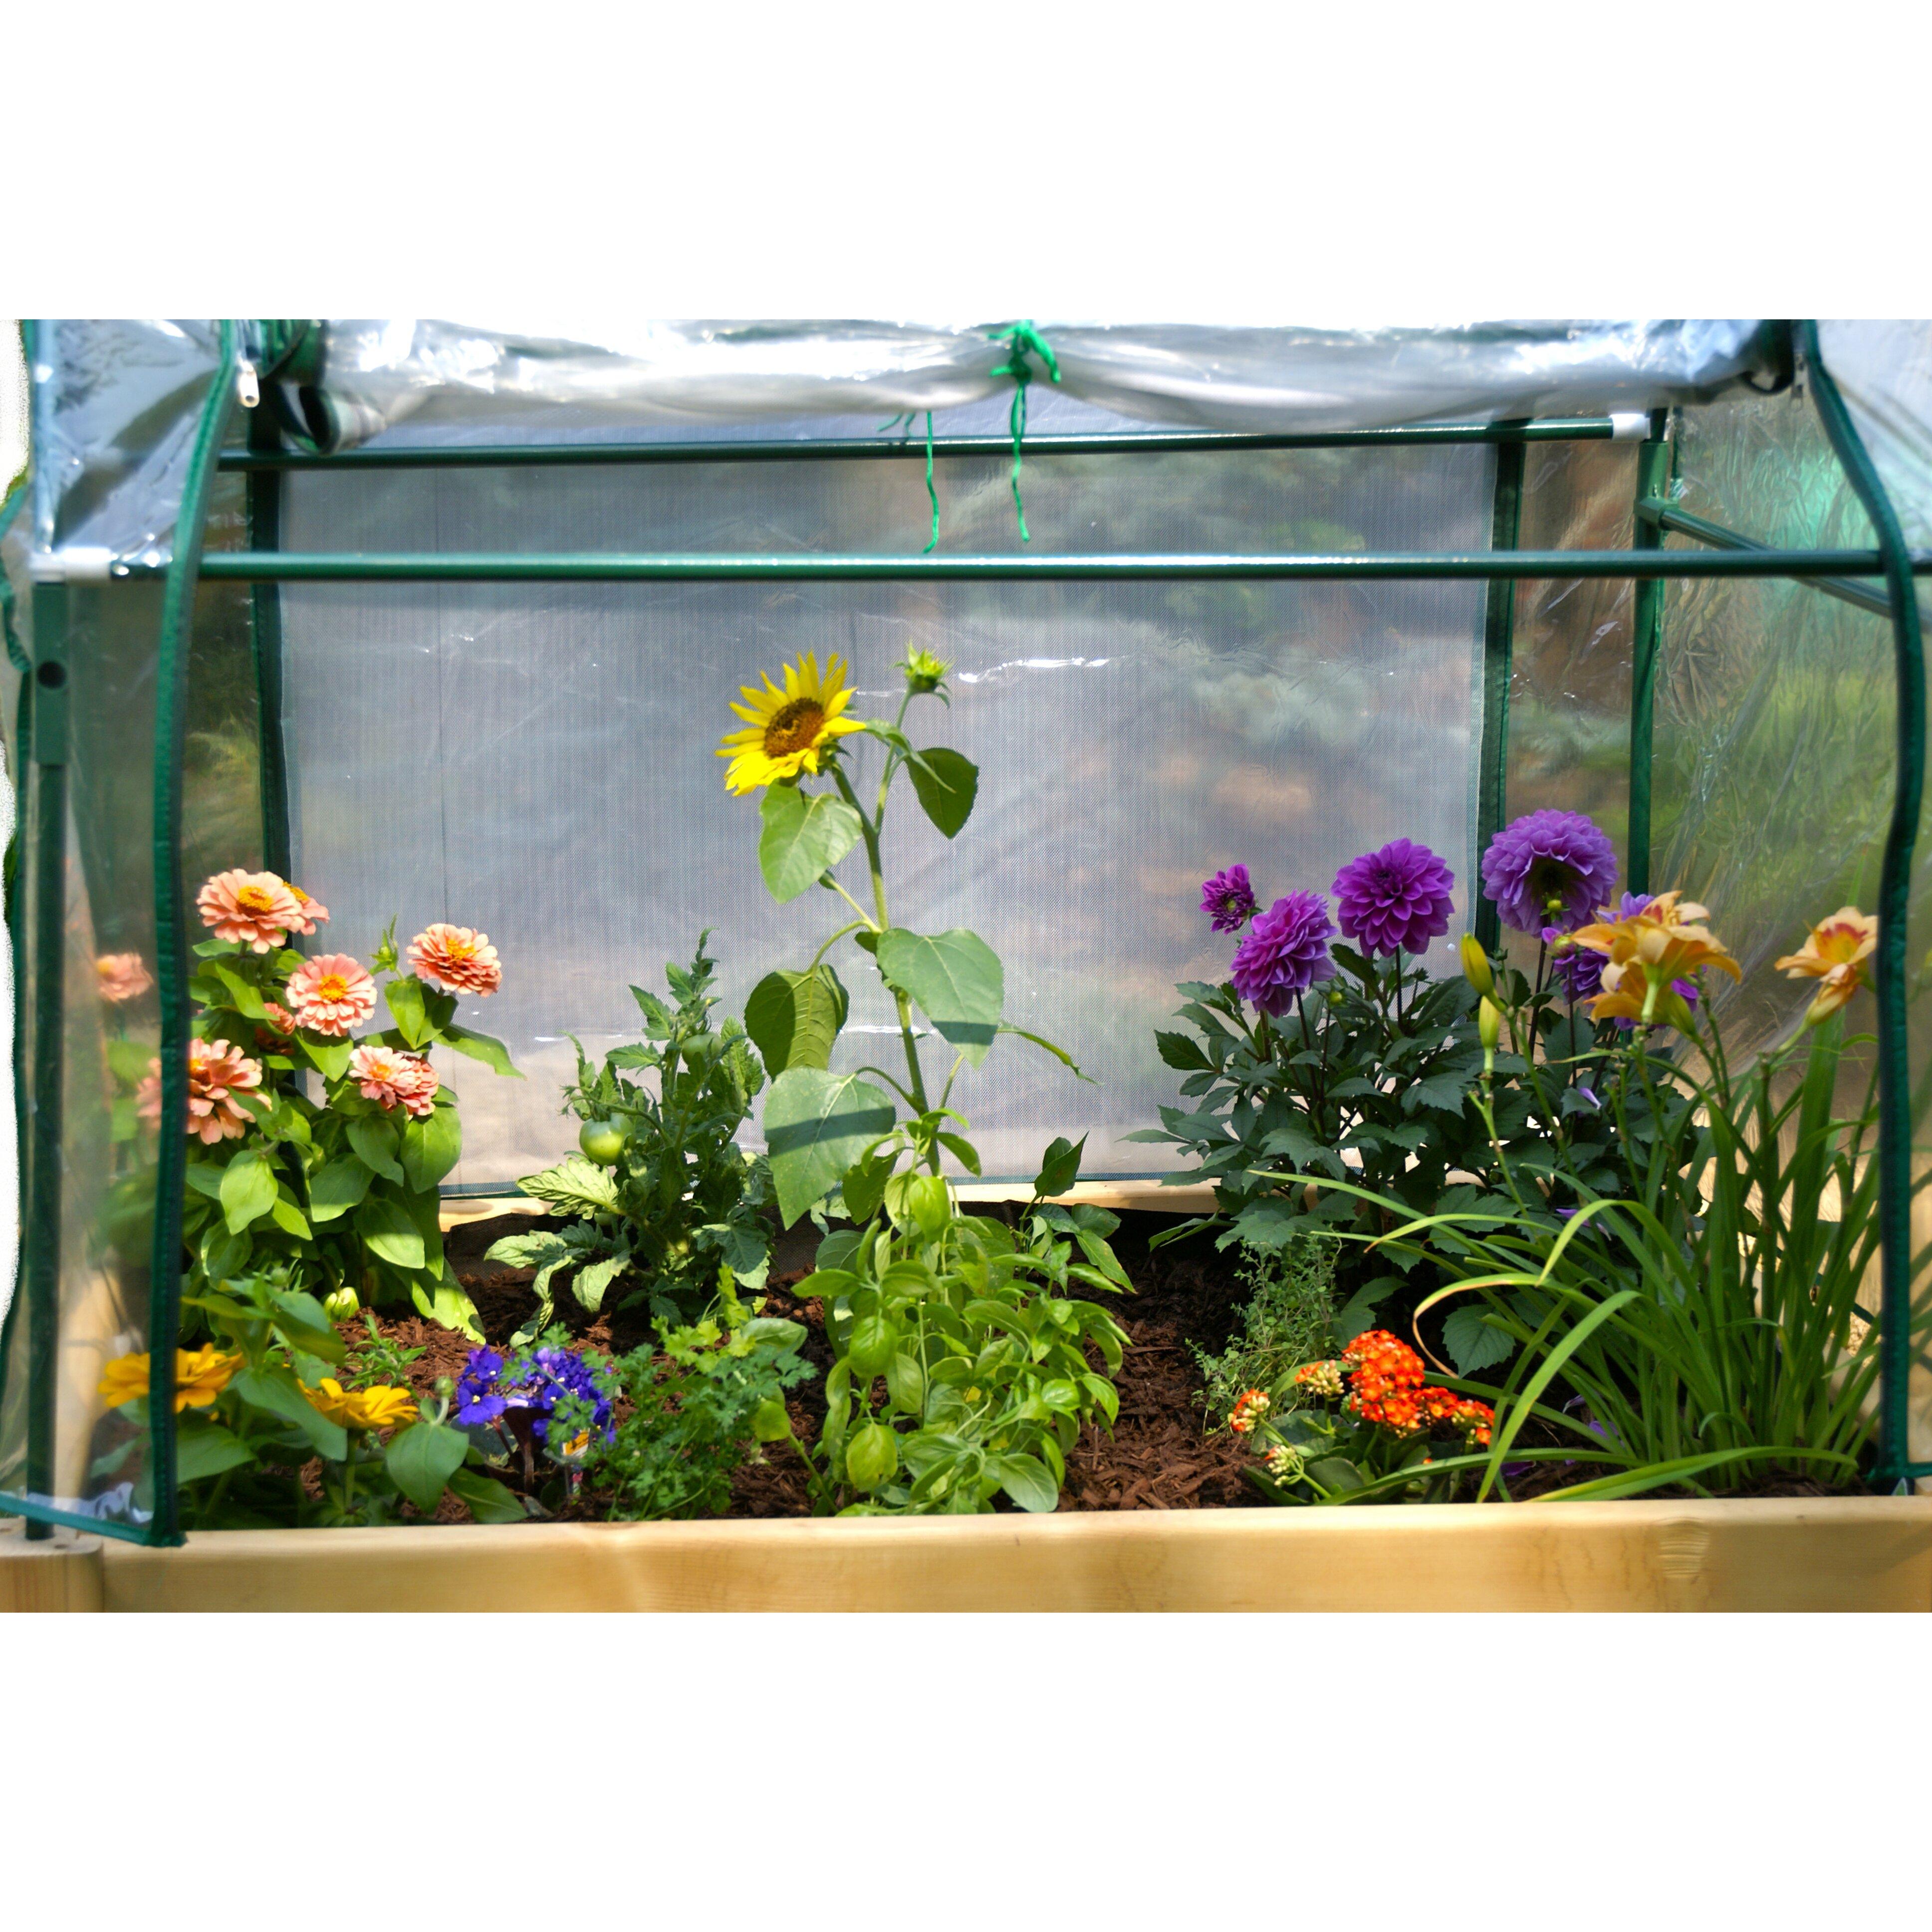 Riverstone industries corporation eden rectangular raised for Garden enclosure